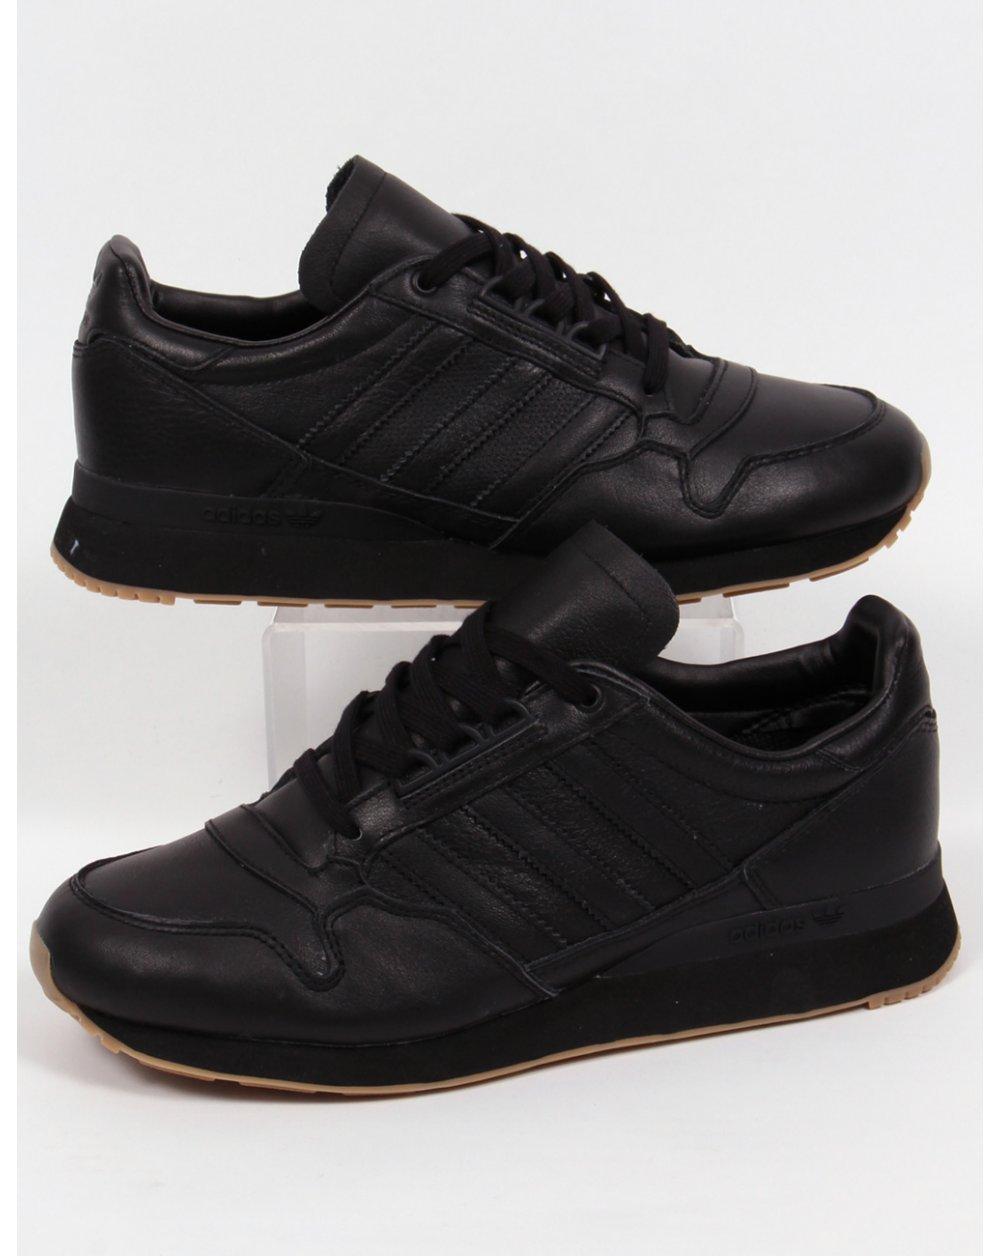 grandes ofertas 2017 calidad real último vendedor caliente Adidas Zx 500 Og Leather Trainers Black/black,originals,shoes ...